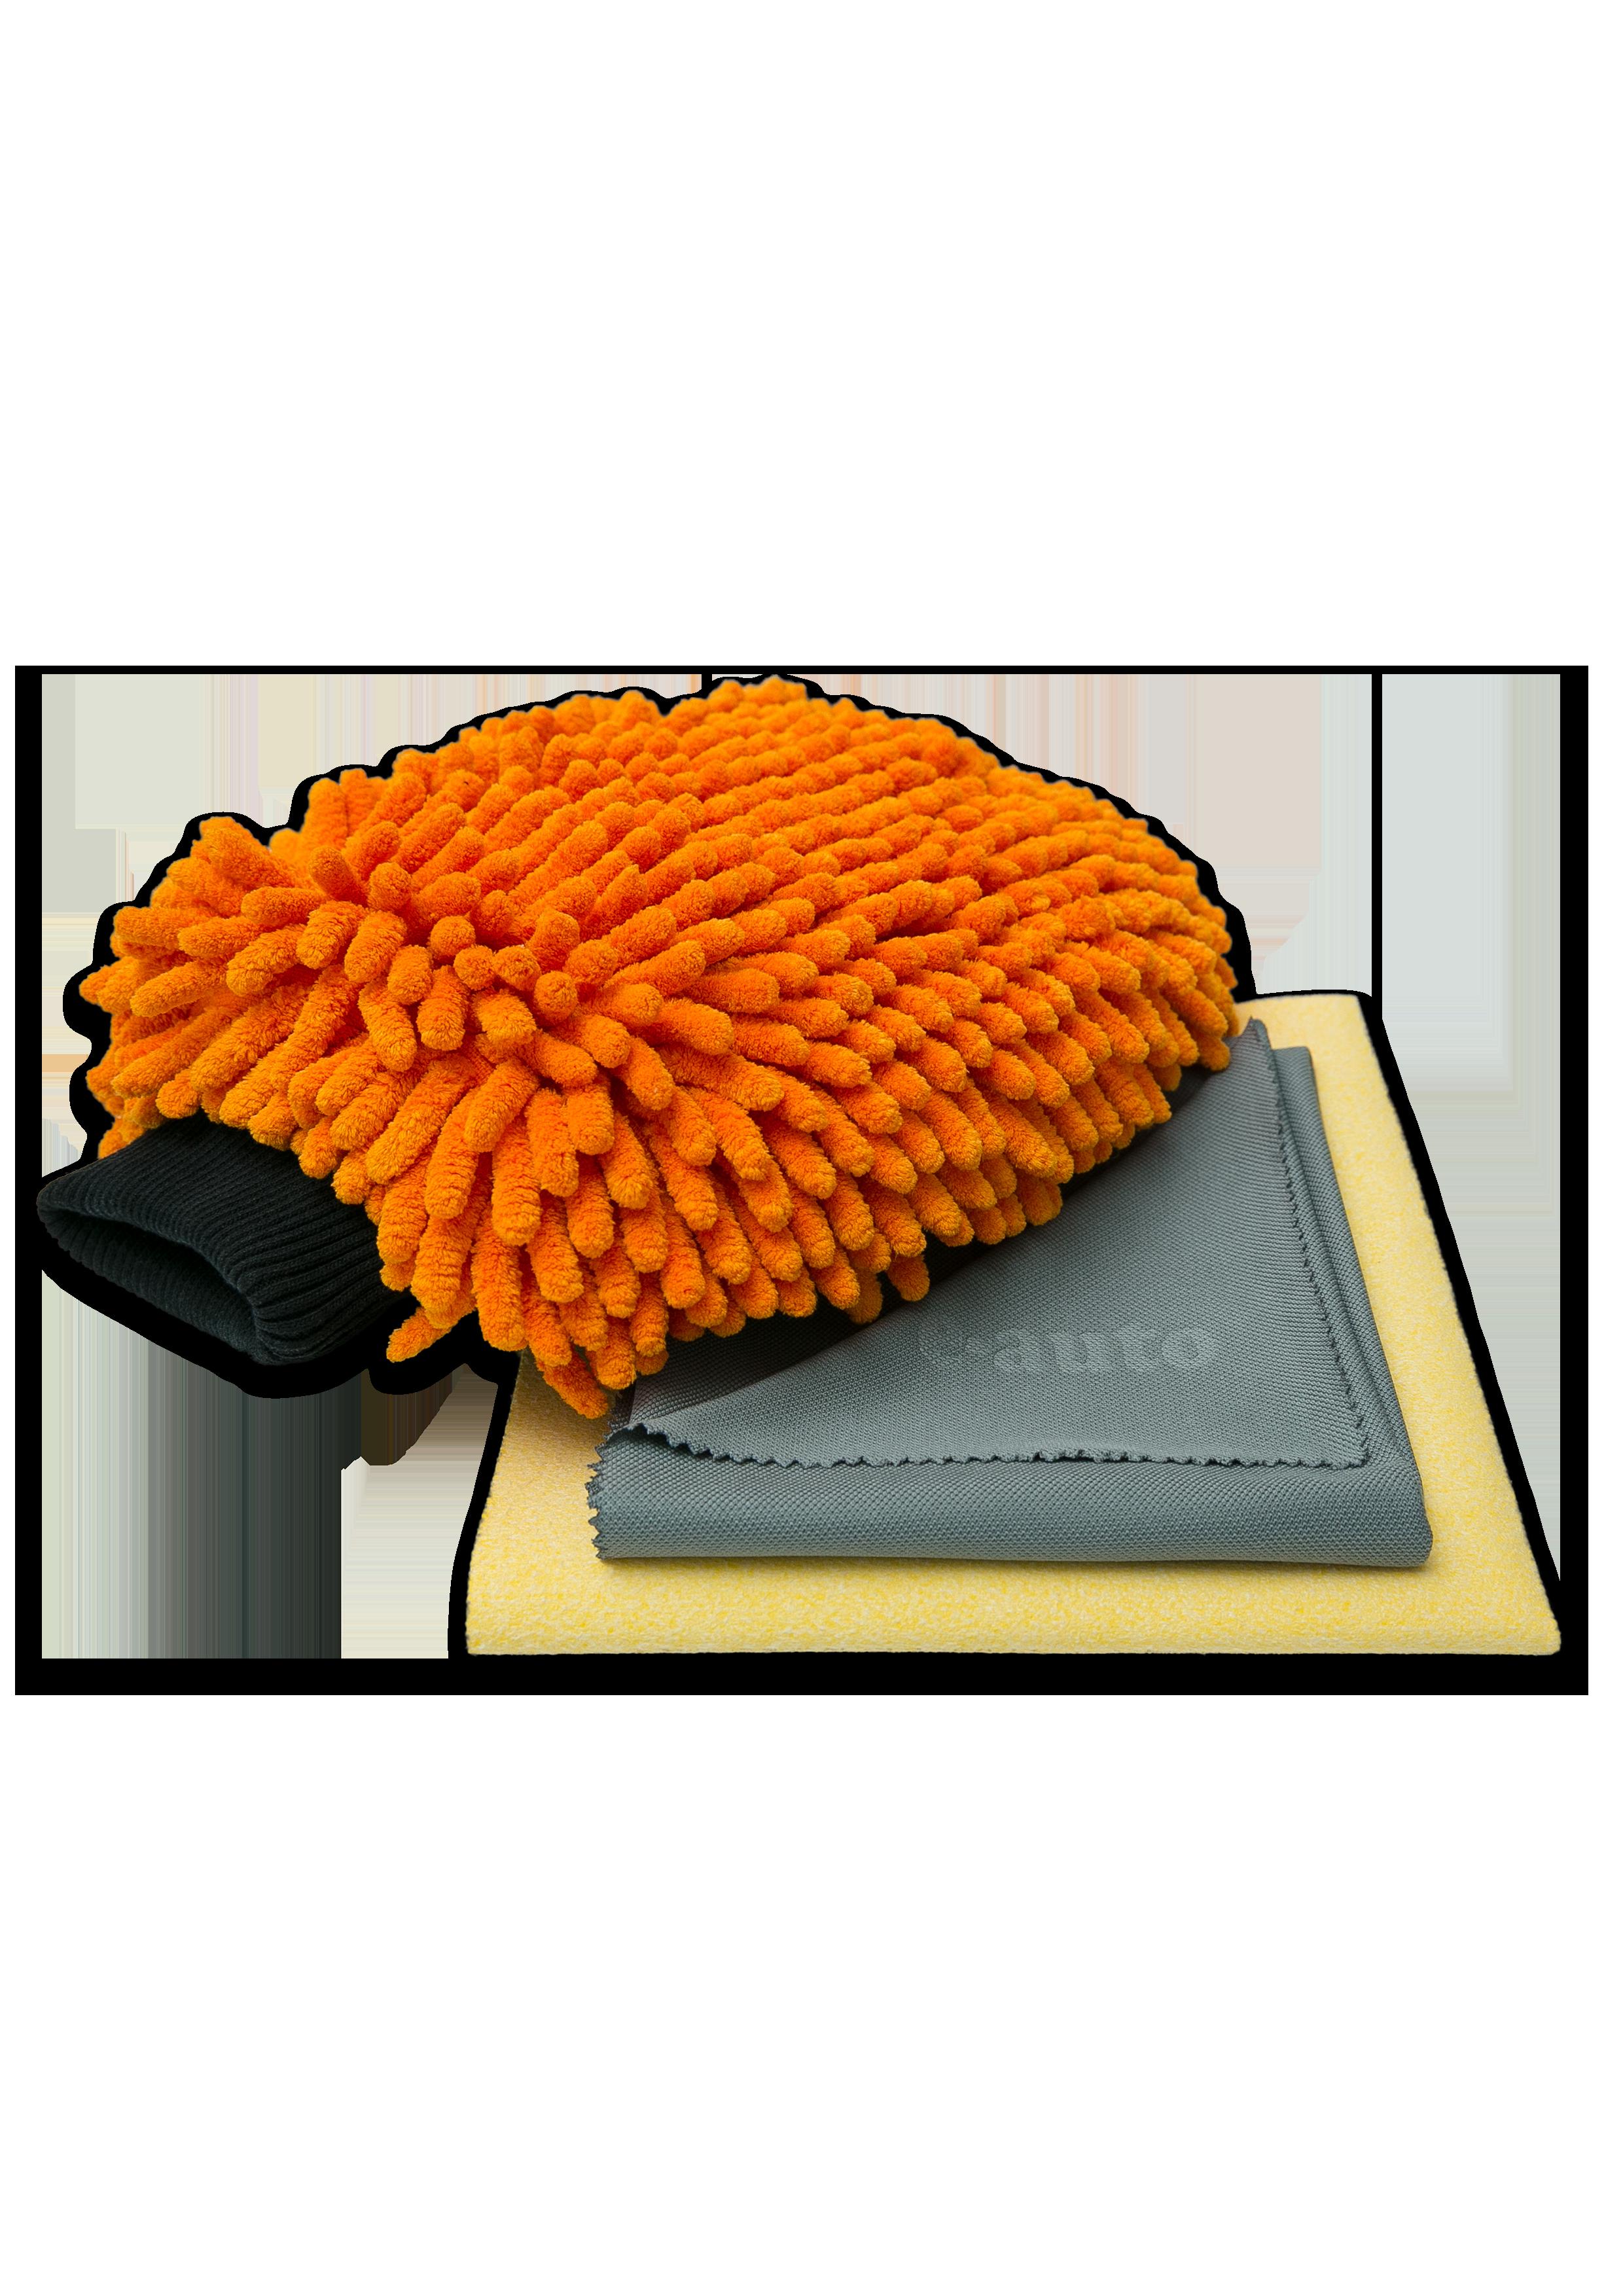 e-ClothCar Cleaning Kit